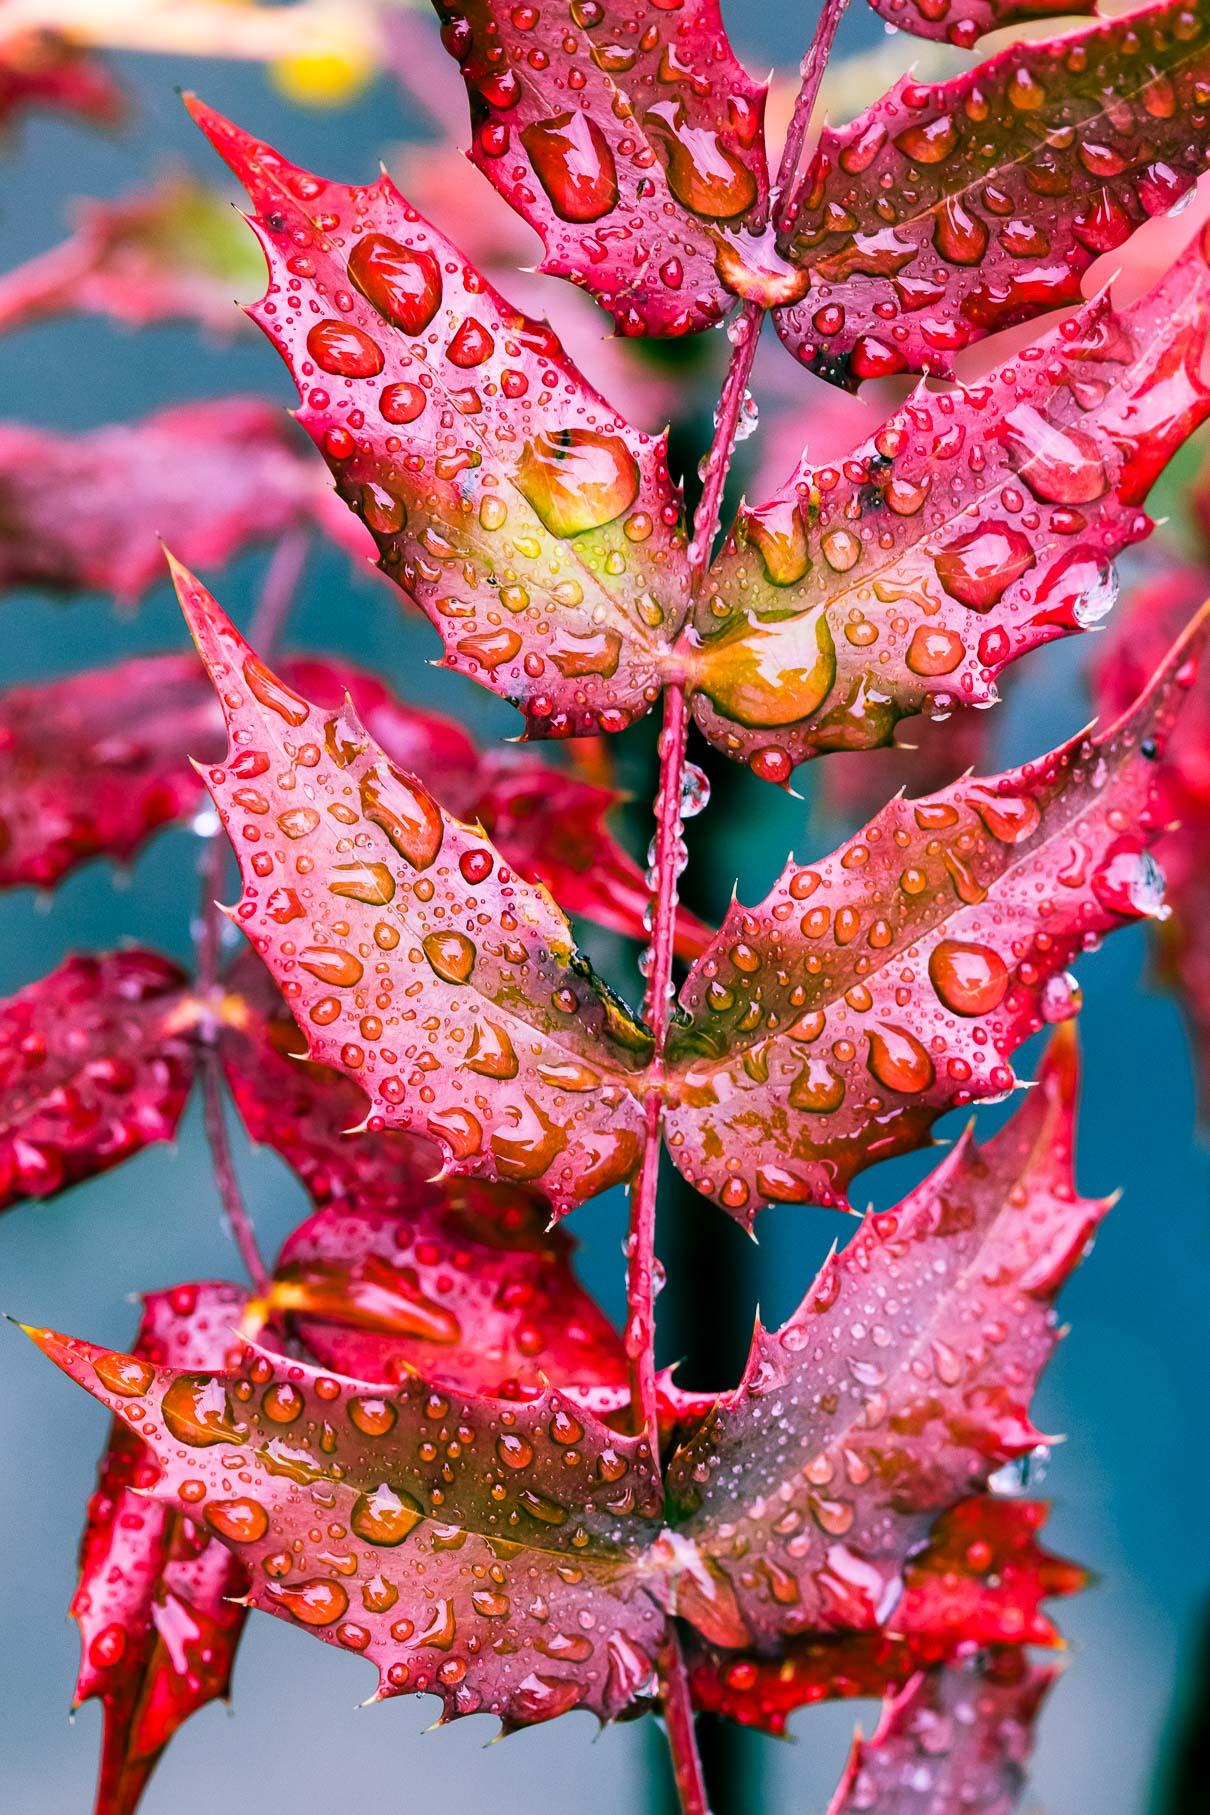 alexa-wright-color-photography-1.jpg